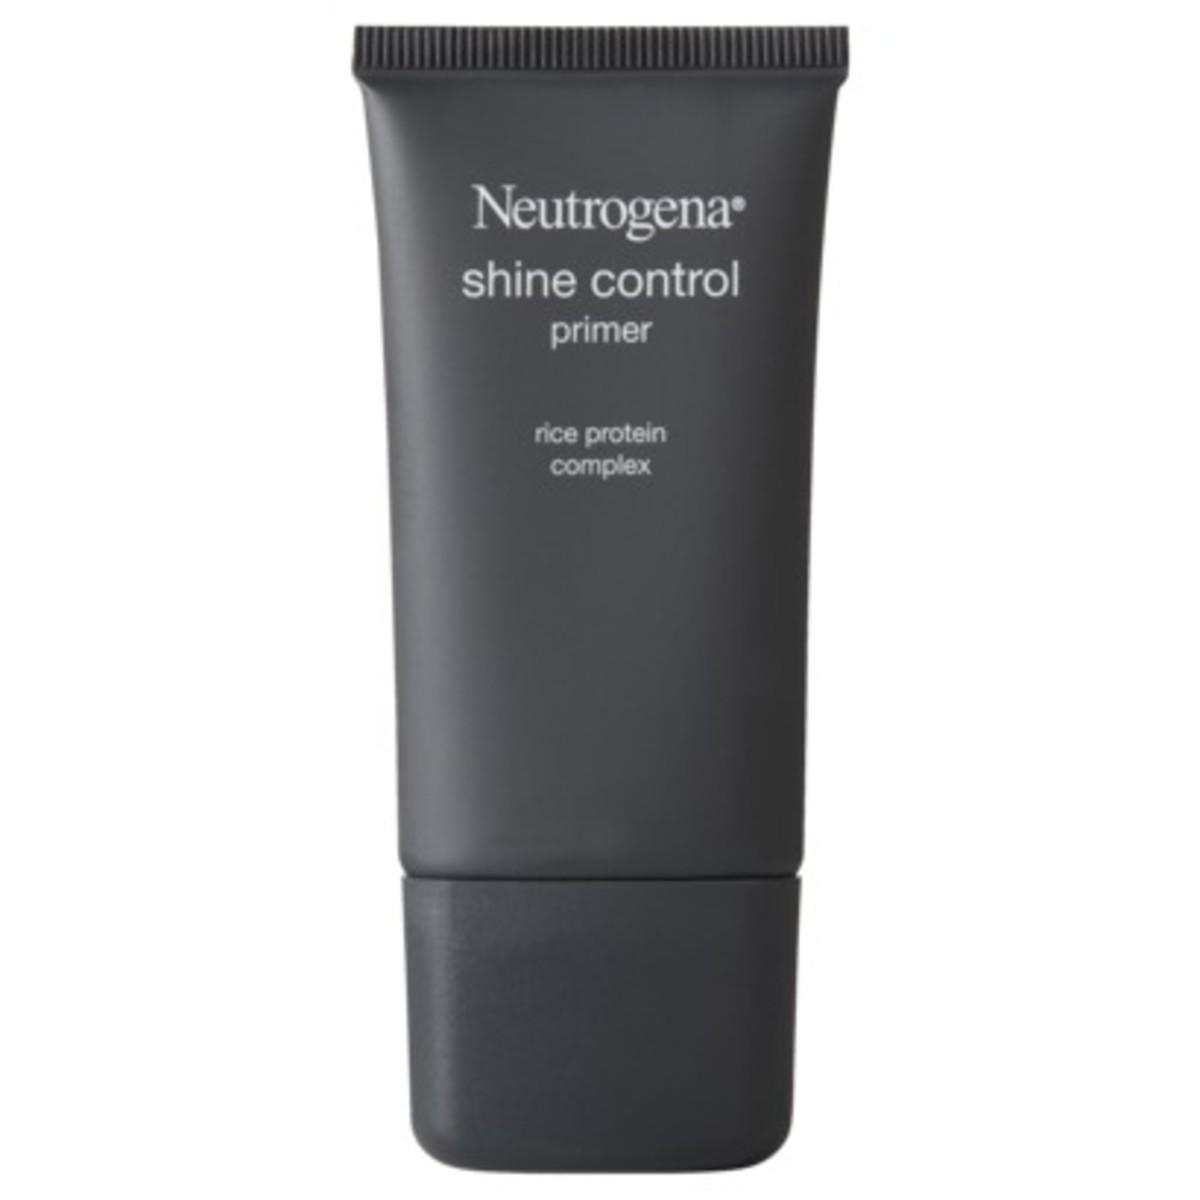 Neutrogena Shine Control Primer